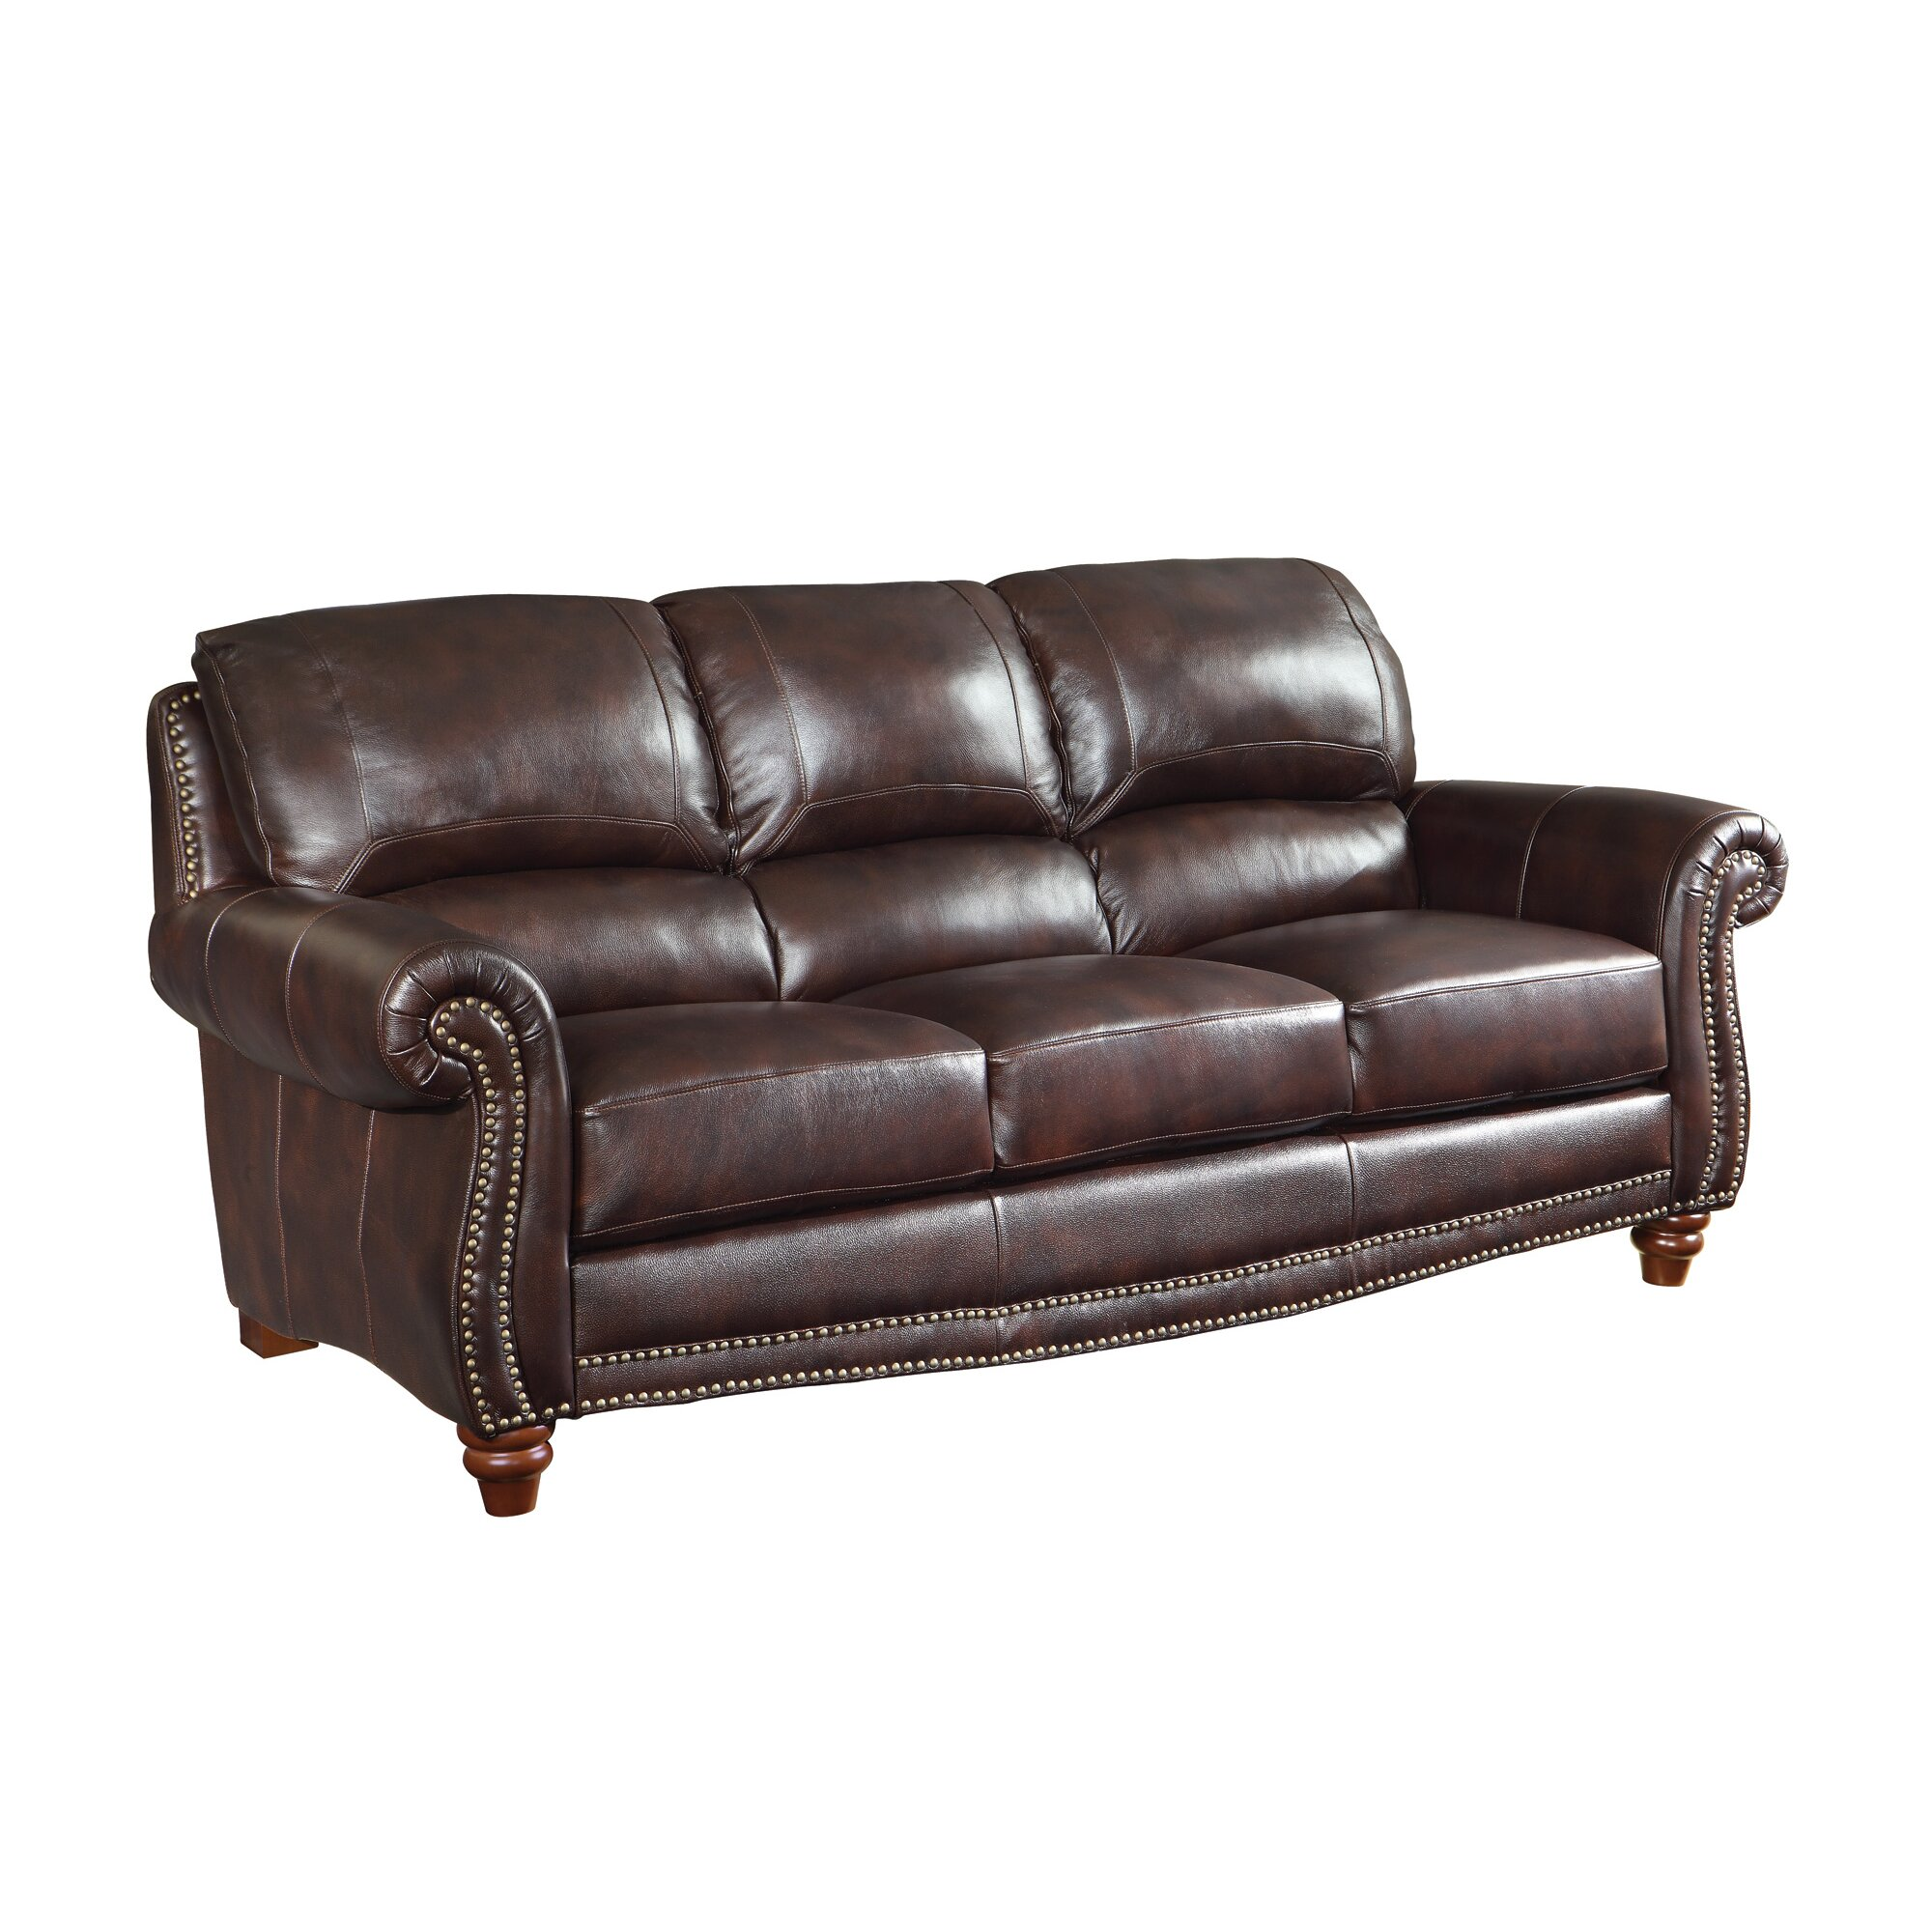 Wildon home leather sofa reviews wayfair